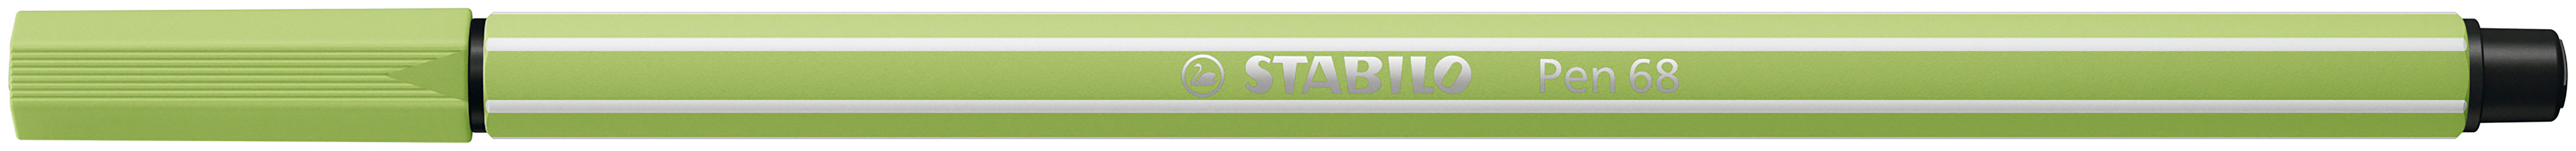 STABILO Stylo Fibre Pen 68 1.0mm 68/34 pistachio